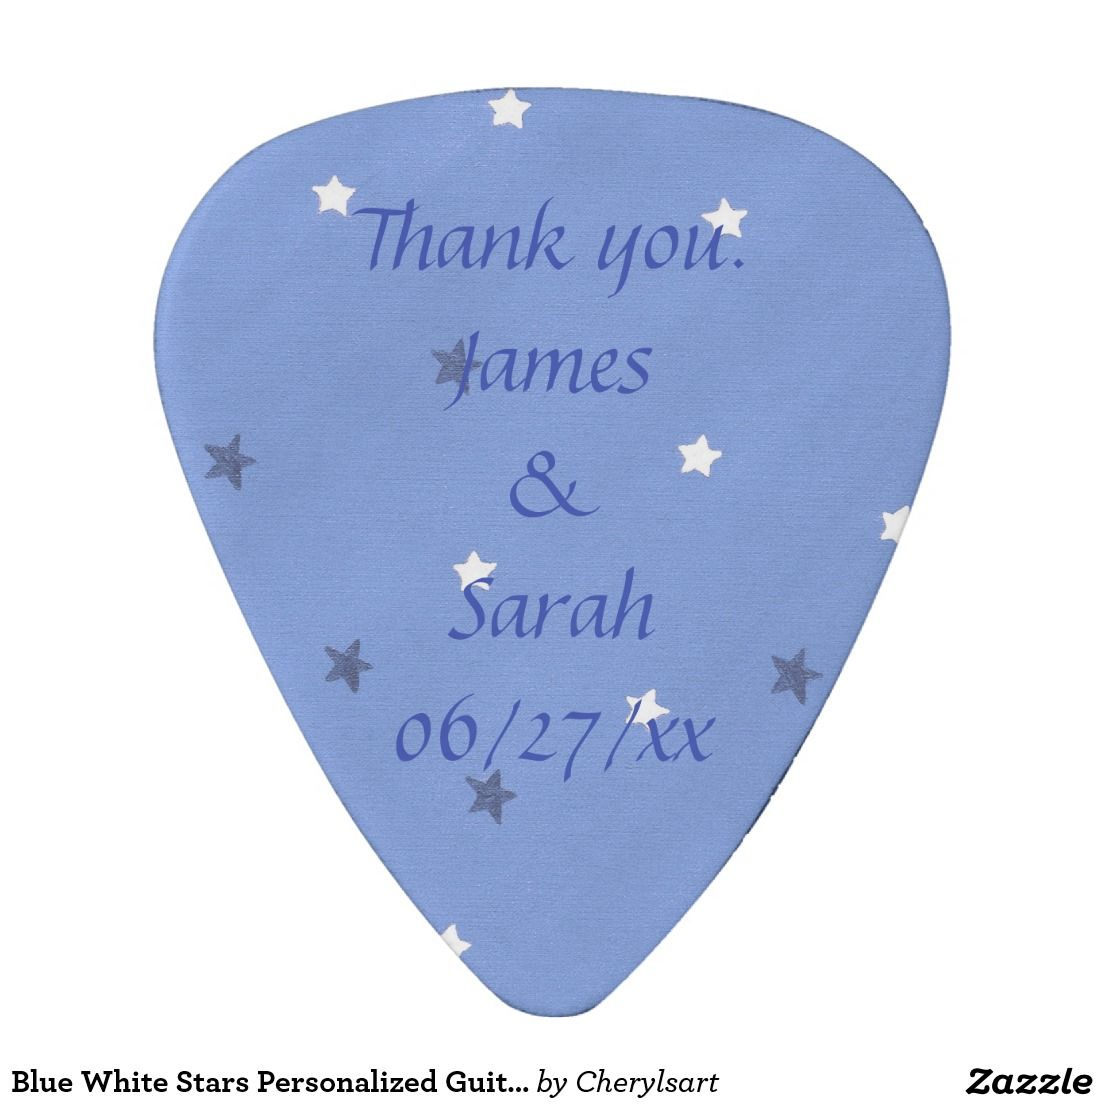 Blue White Stars Personalized Guitar Picks Favors Pinterest